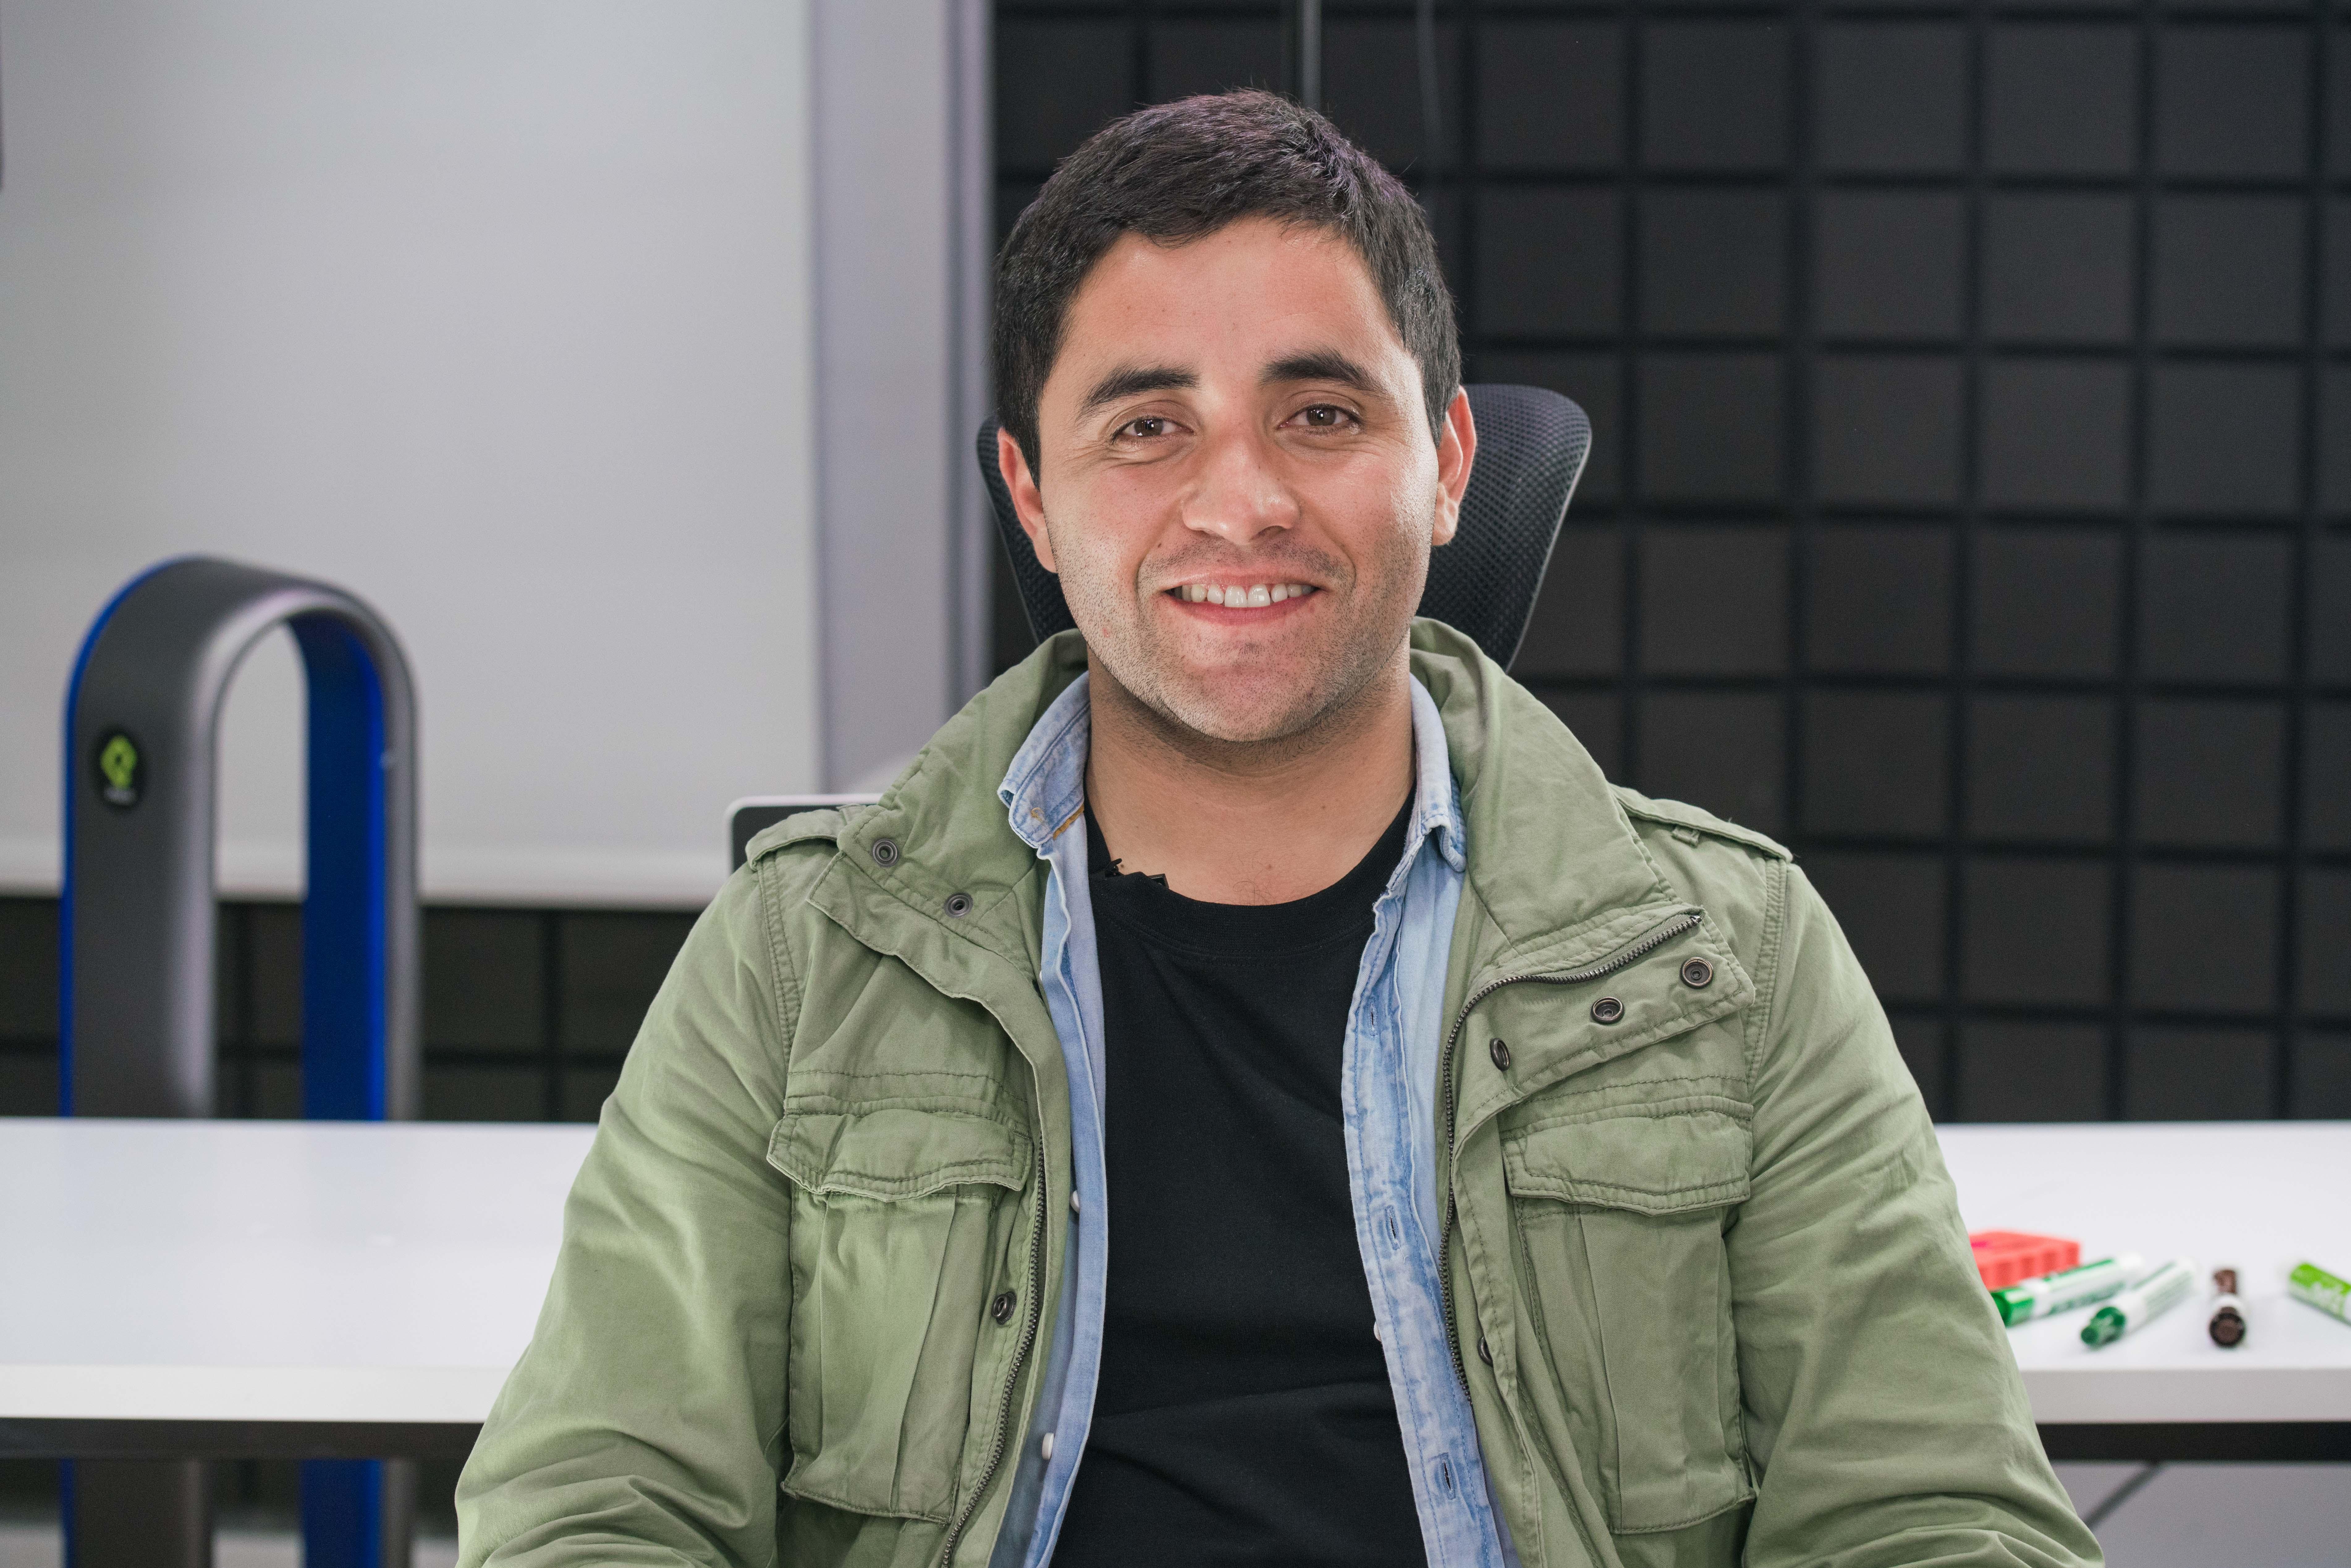 Matías Villanueva